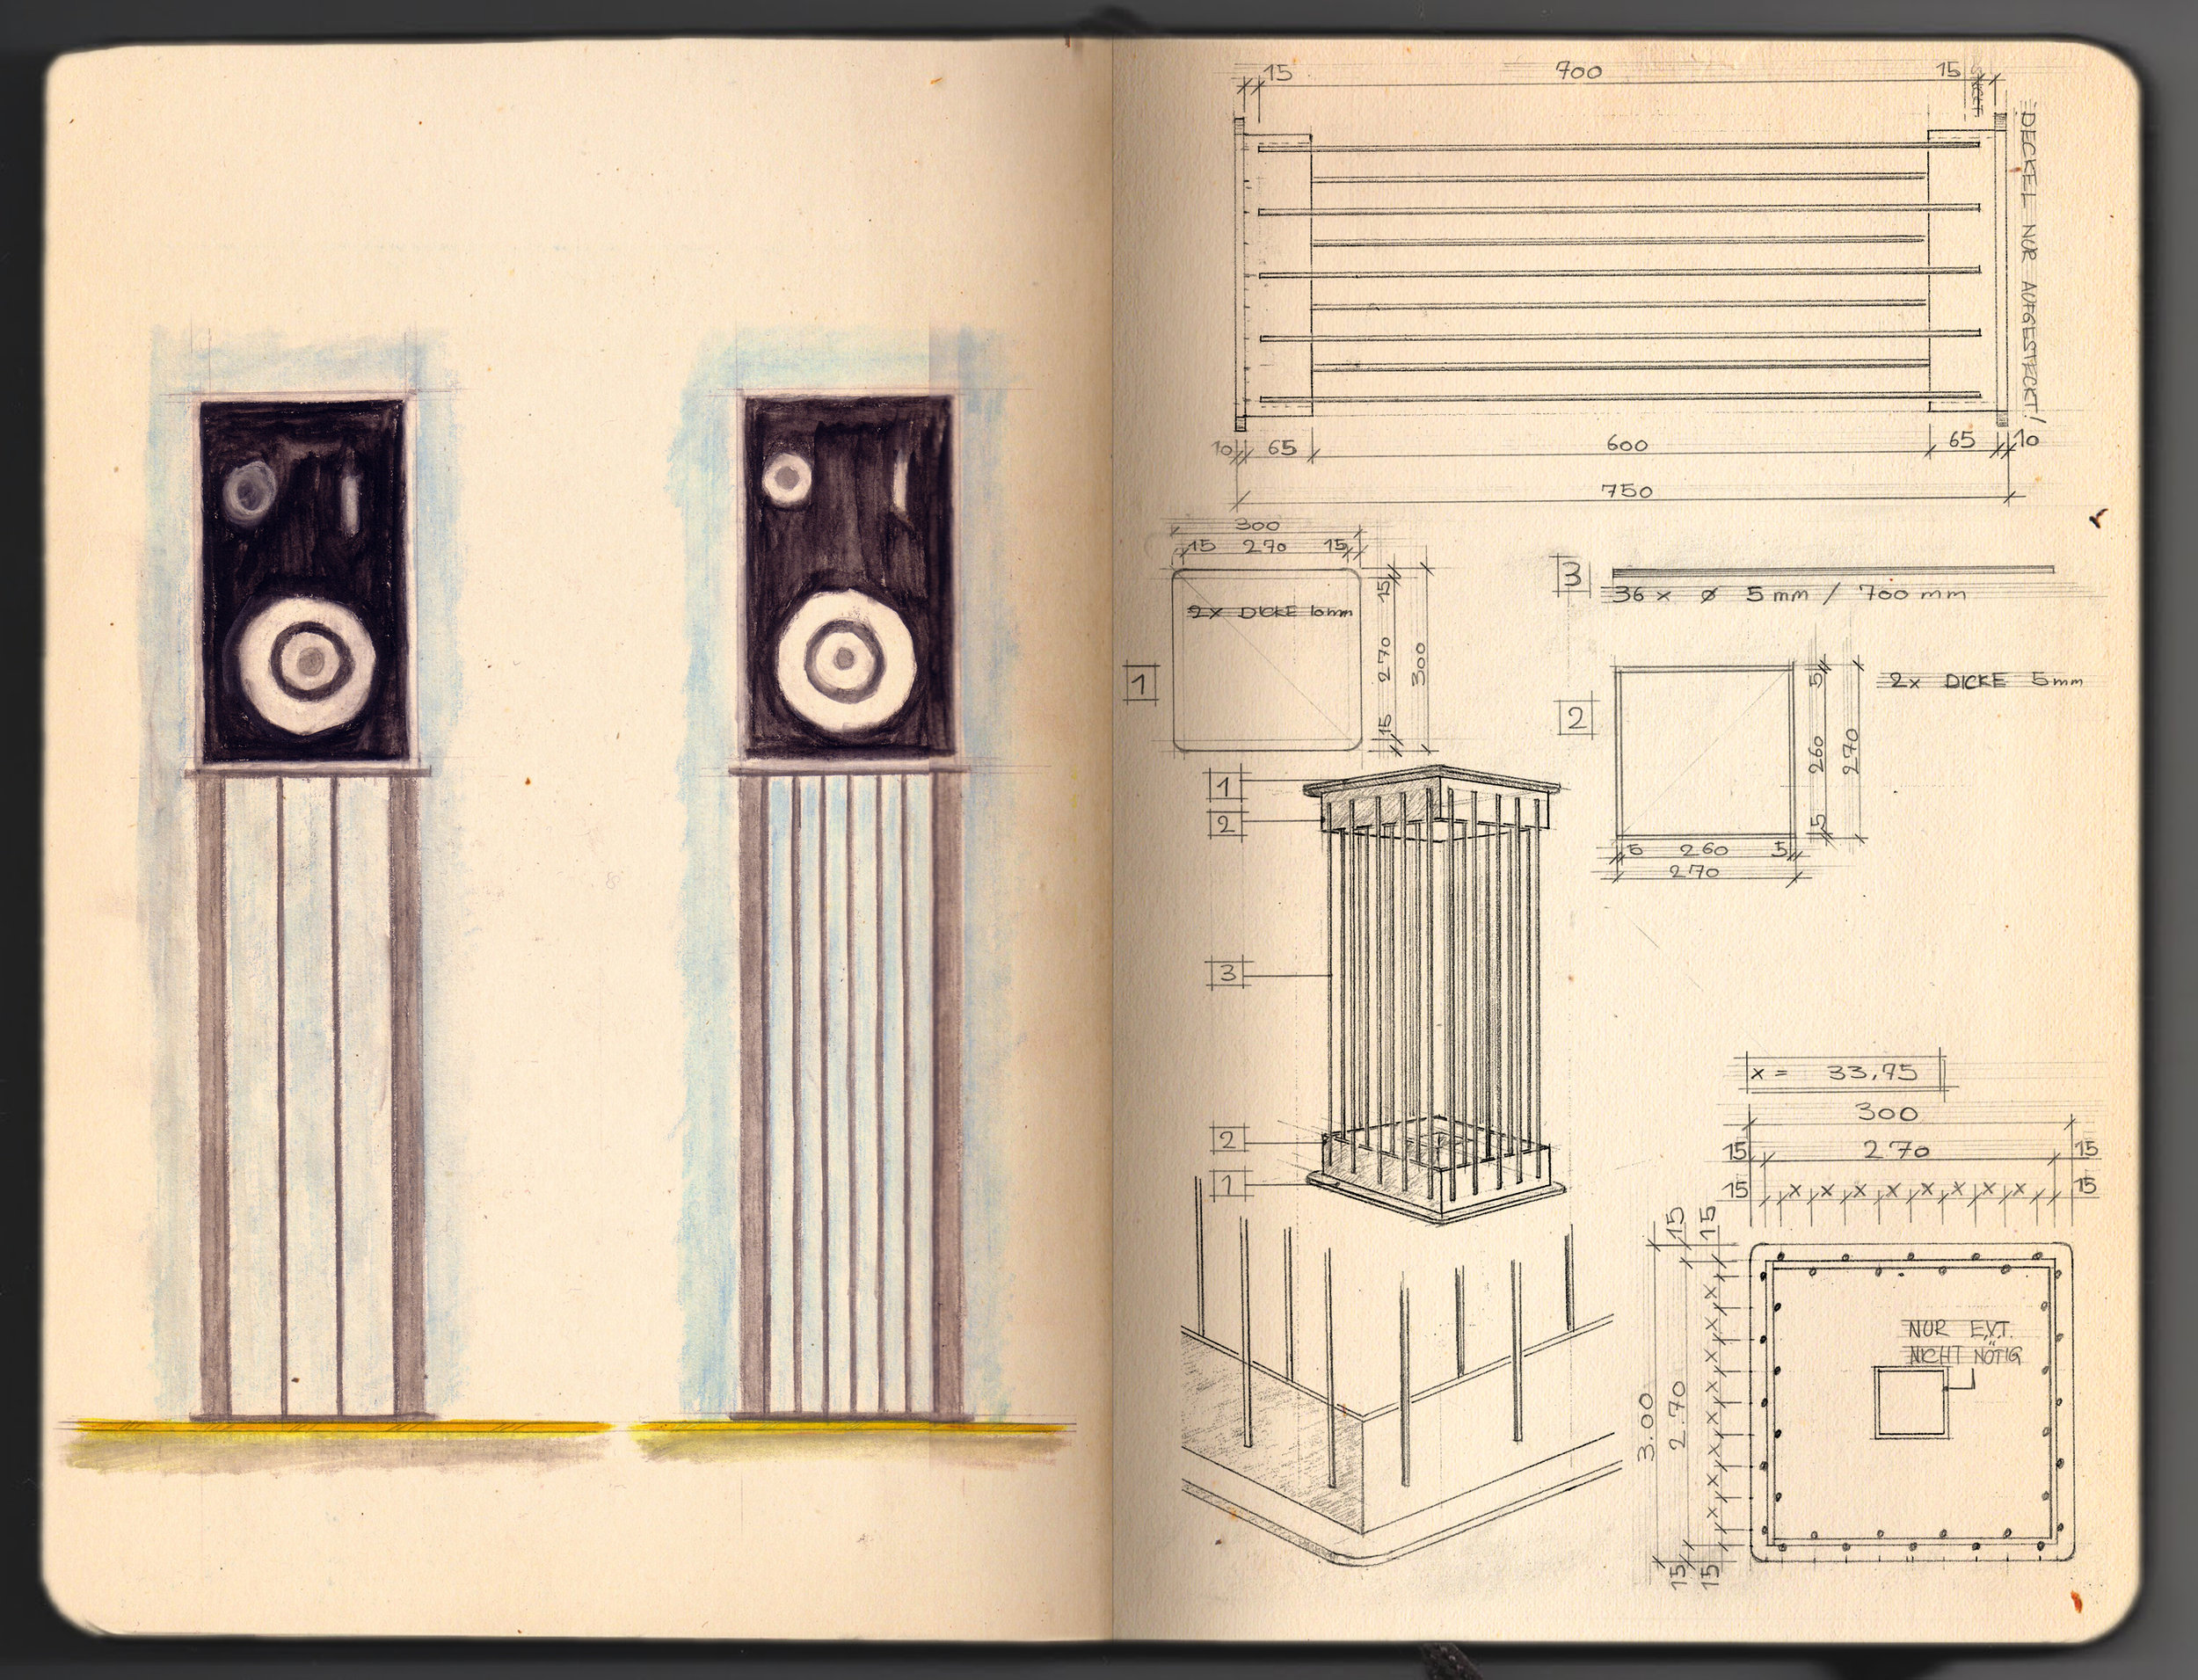 moleskine-book006.jpg